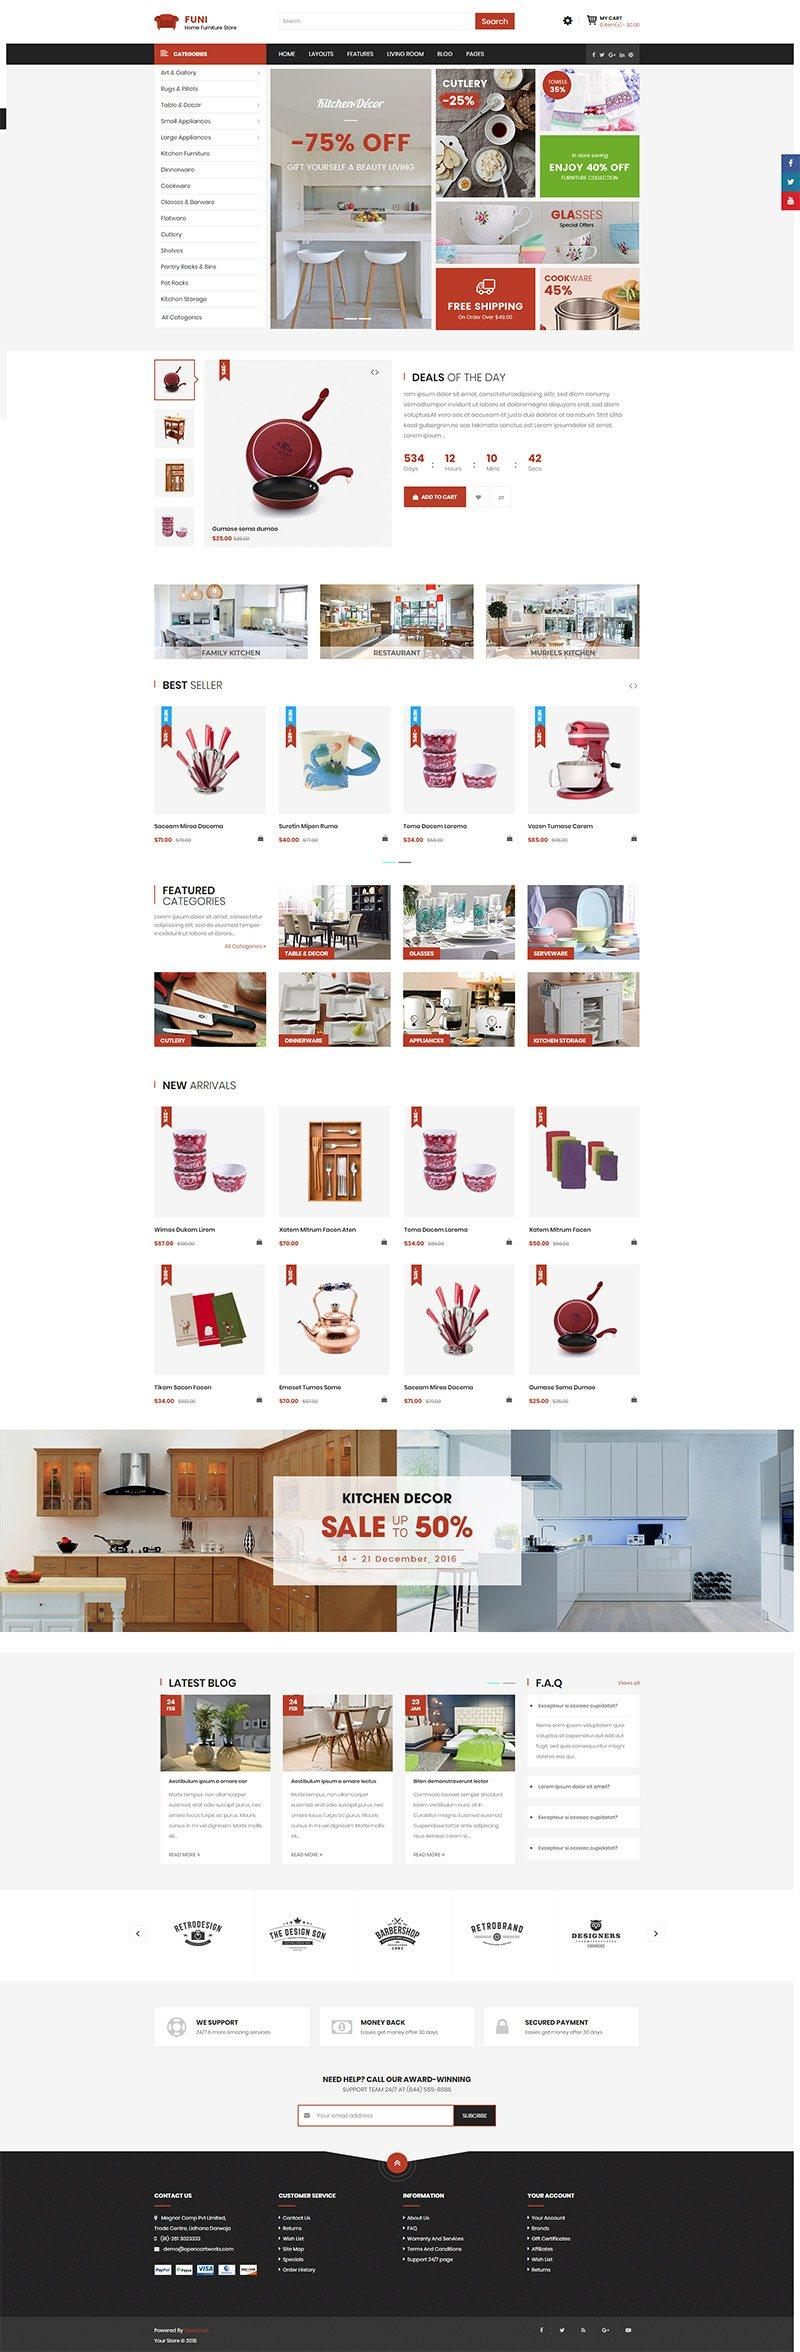 Giao-dien-website-thuong-mai-dien-tu-funi